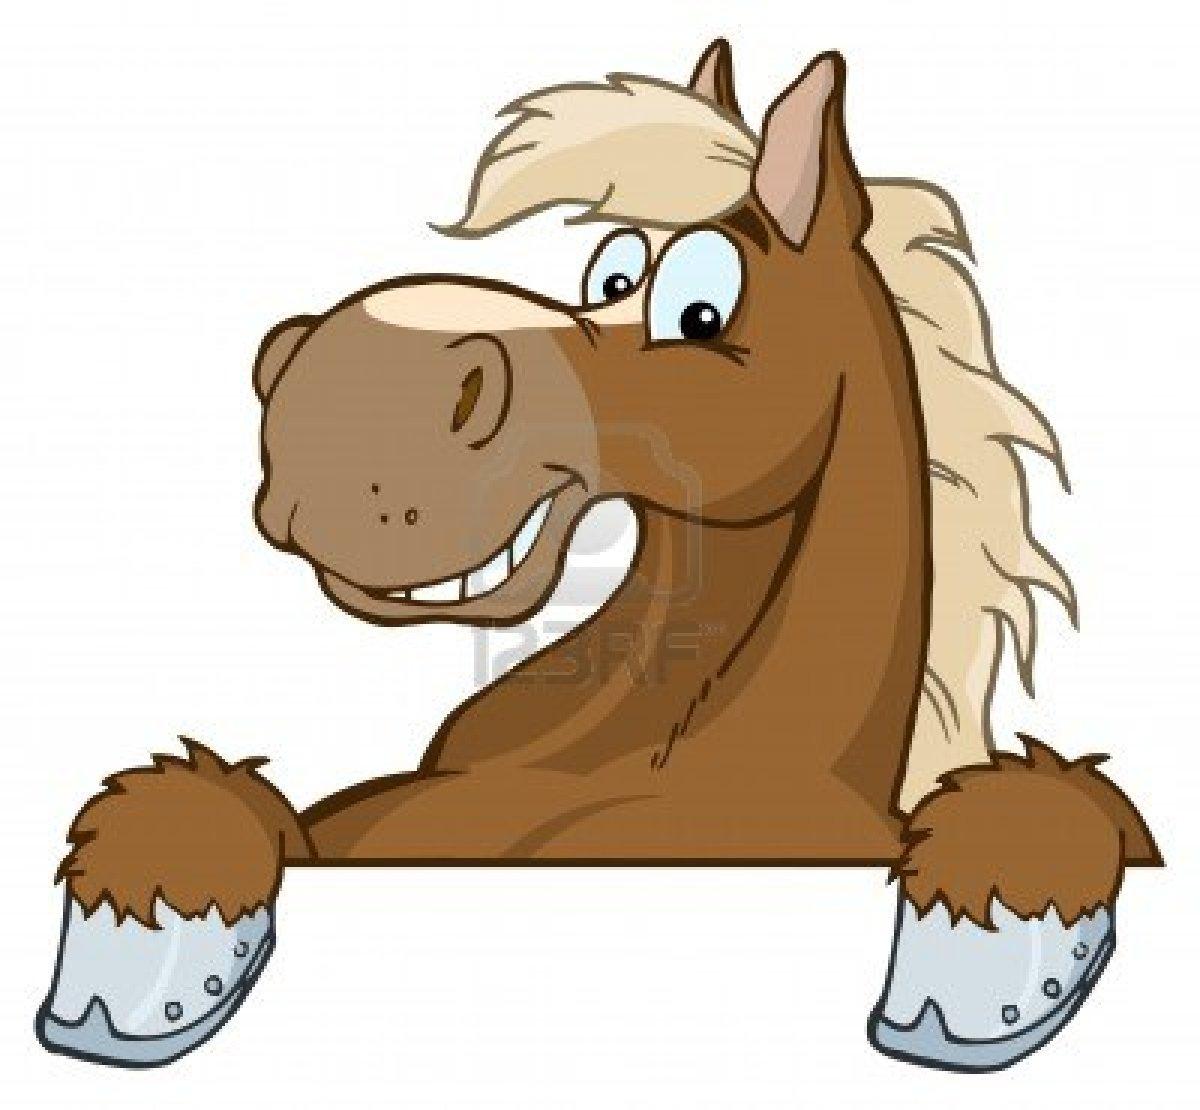 dessins en couleurs imprimer cheval num ro 70253. Black Bedroom Furniture Sets. Home Design Ideas